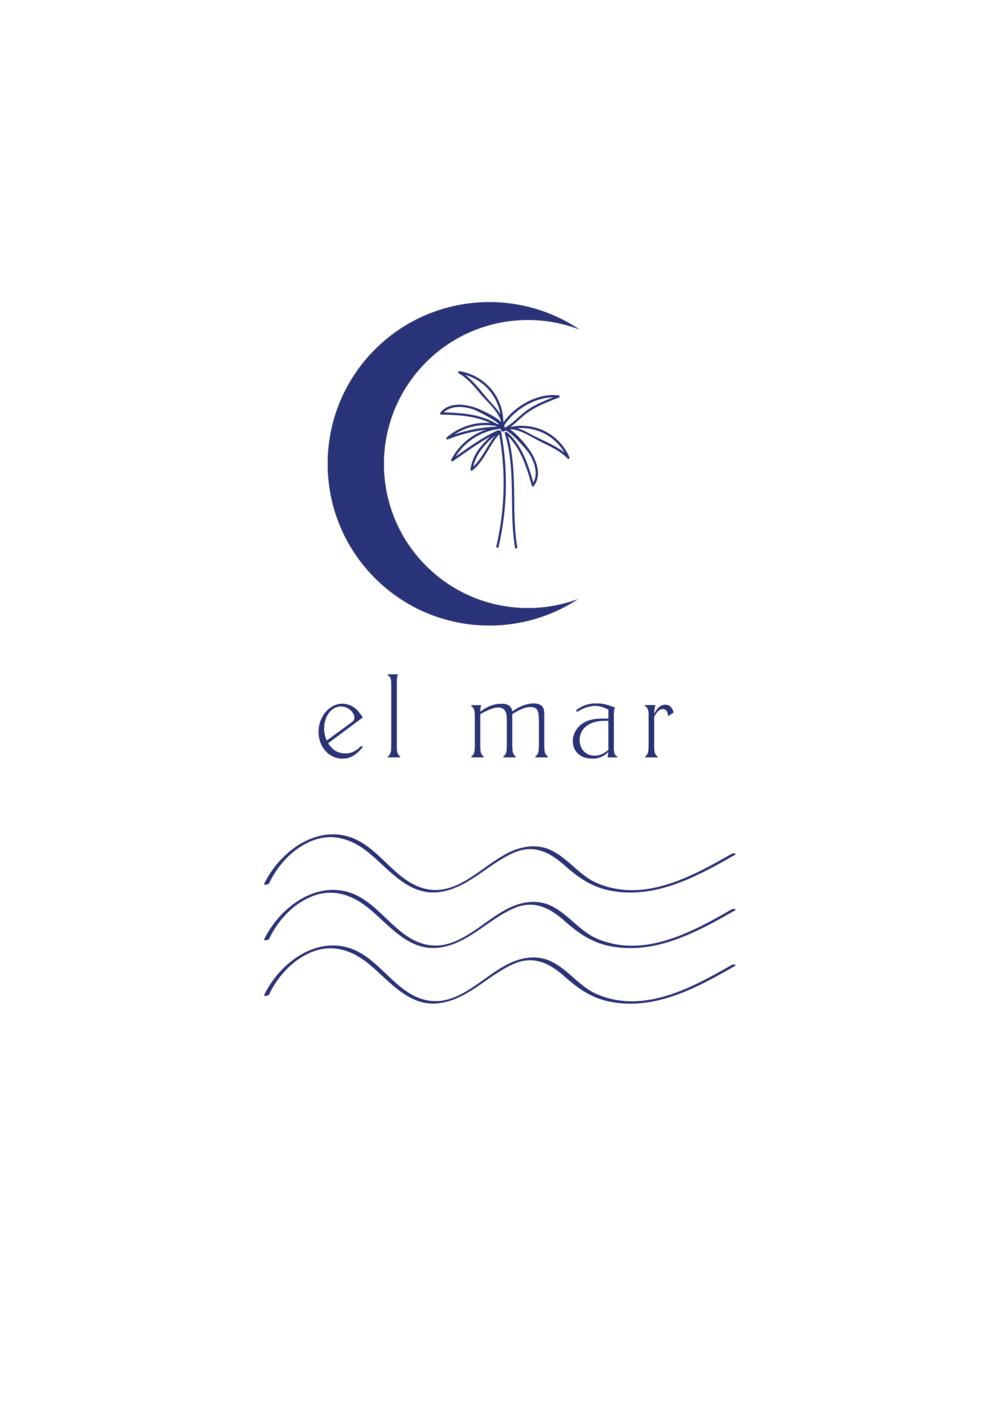 el mar branding variation // phylleli design studio and blog